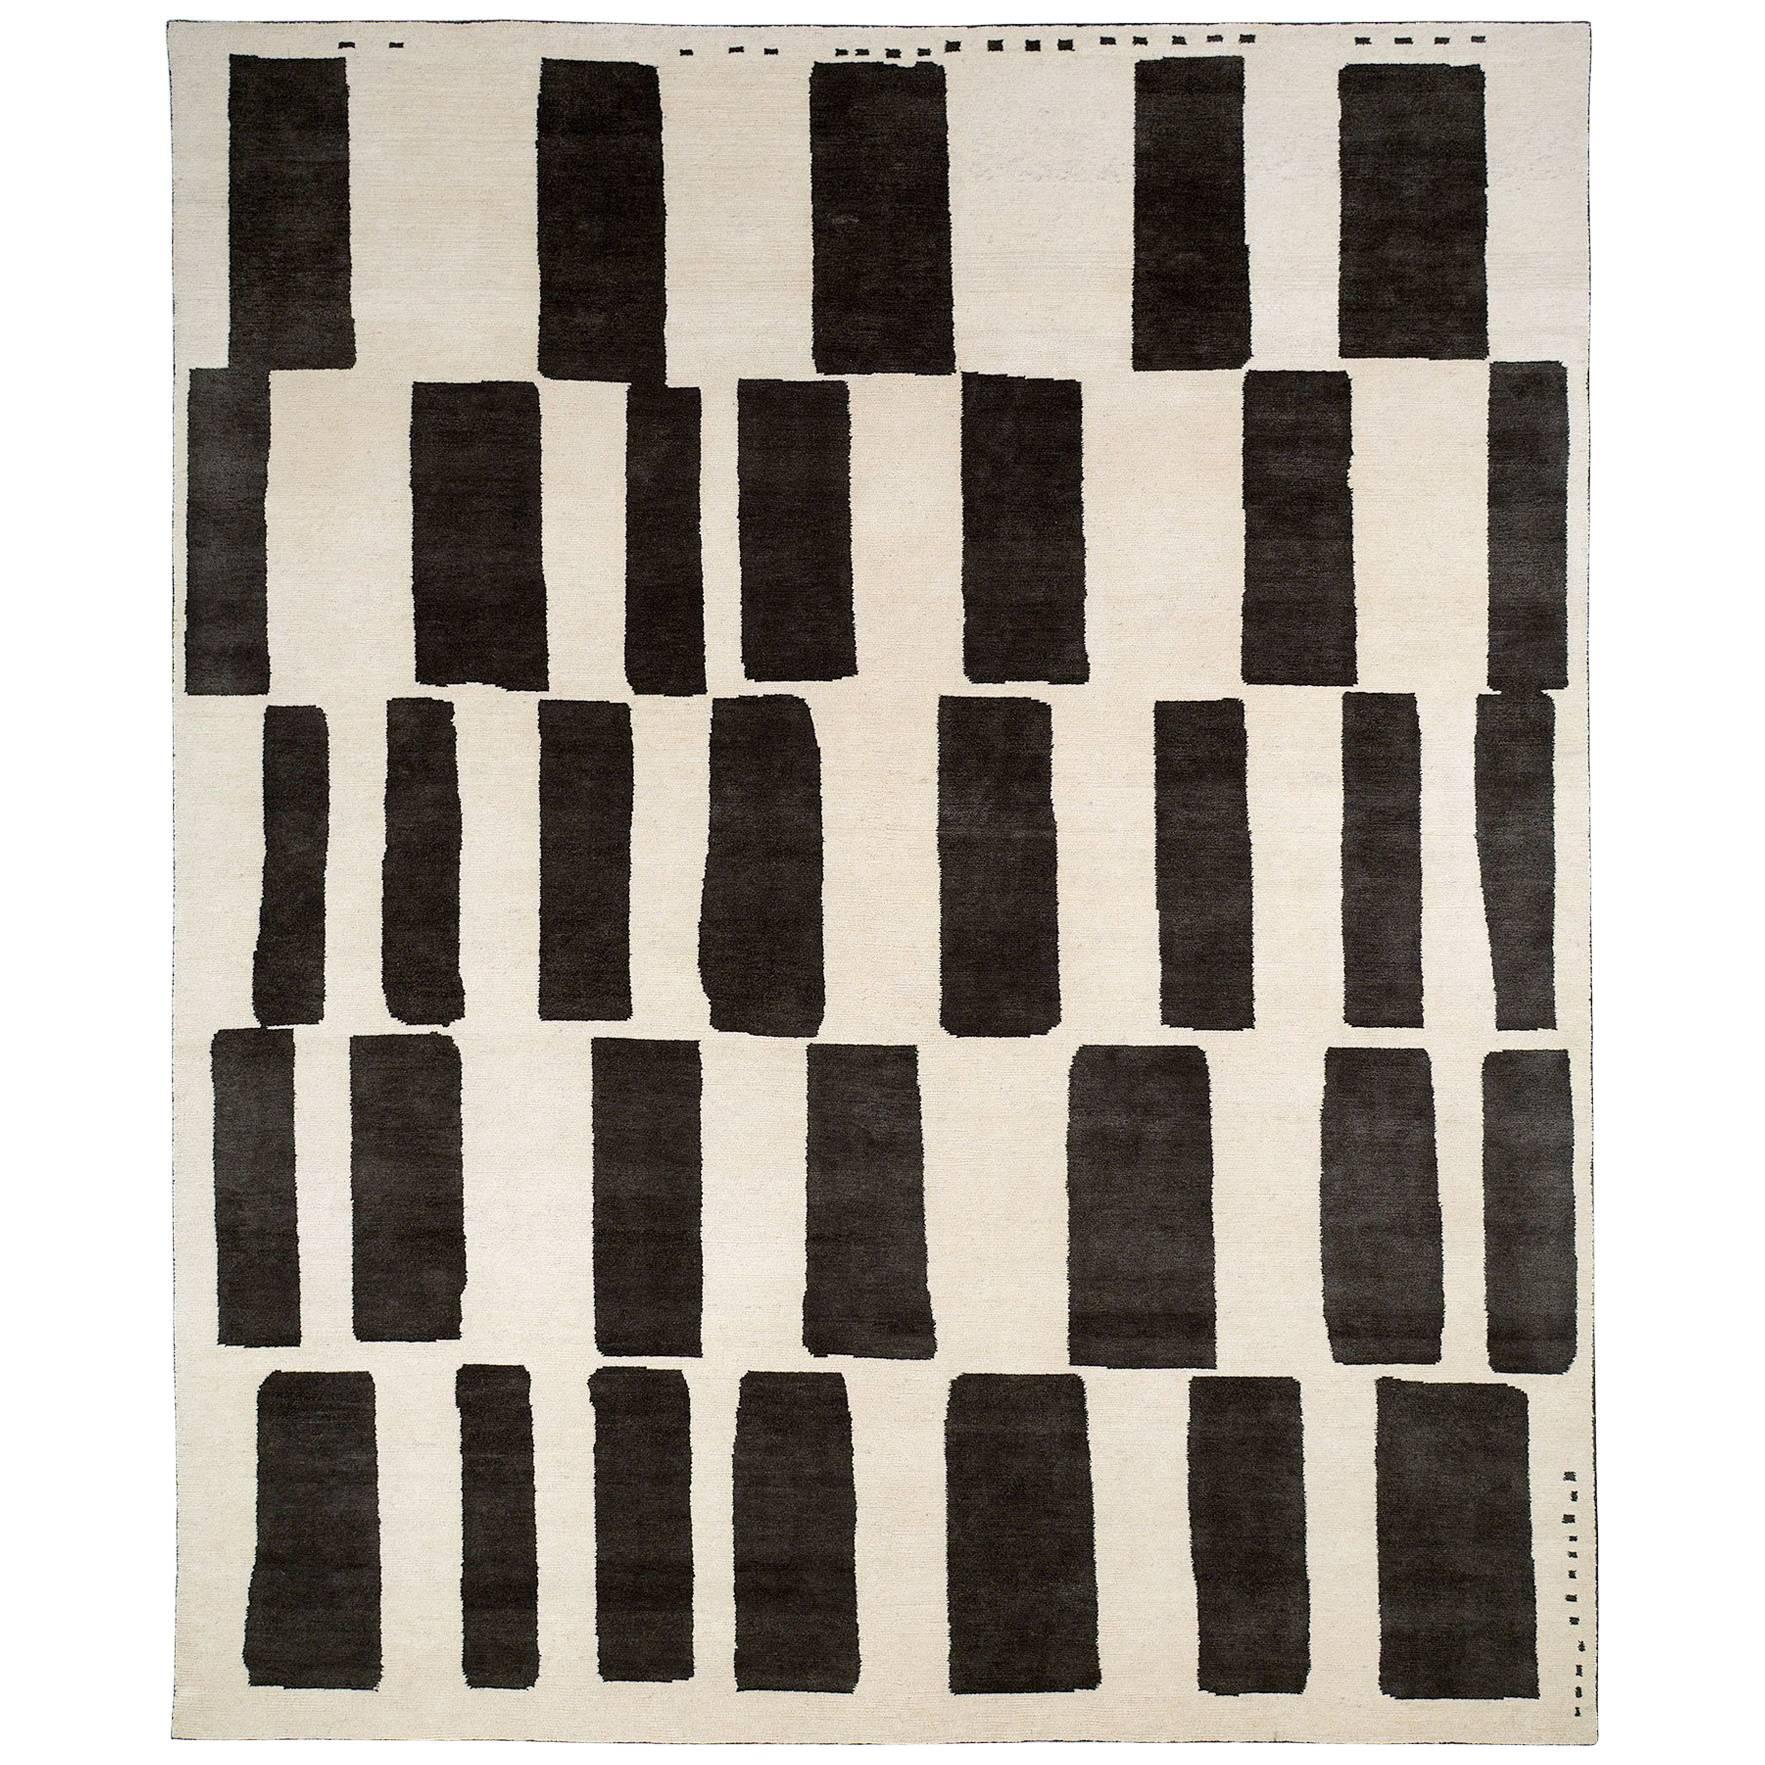 Black and White Tibetan Wool and Silk Area Rug By CARINI 8x10